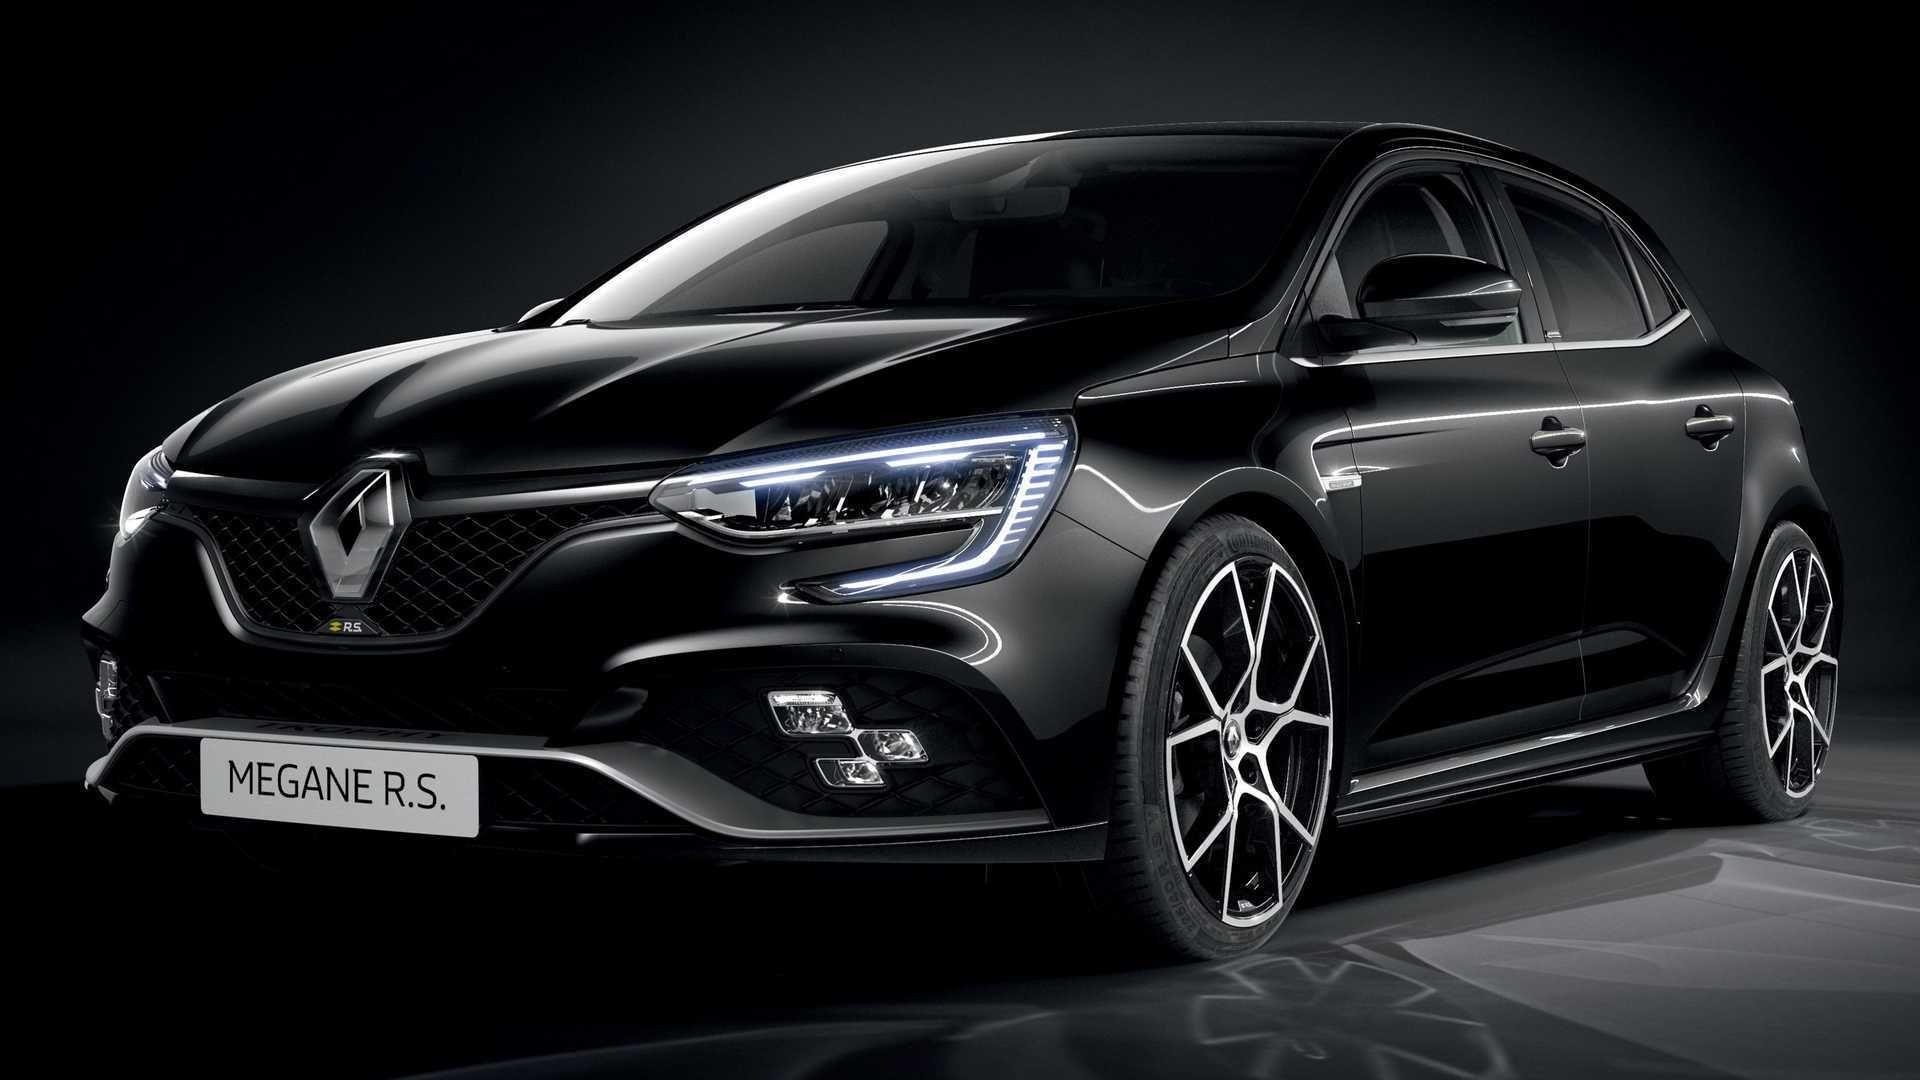 Groupe Renault Megane